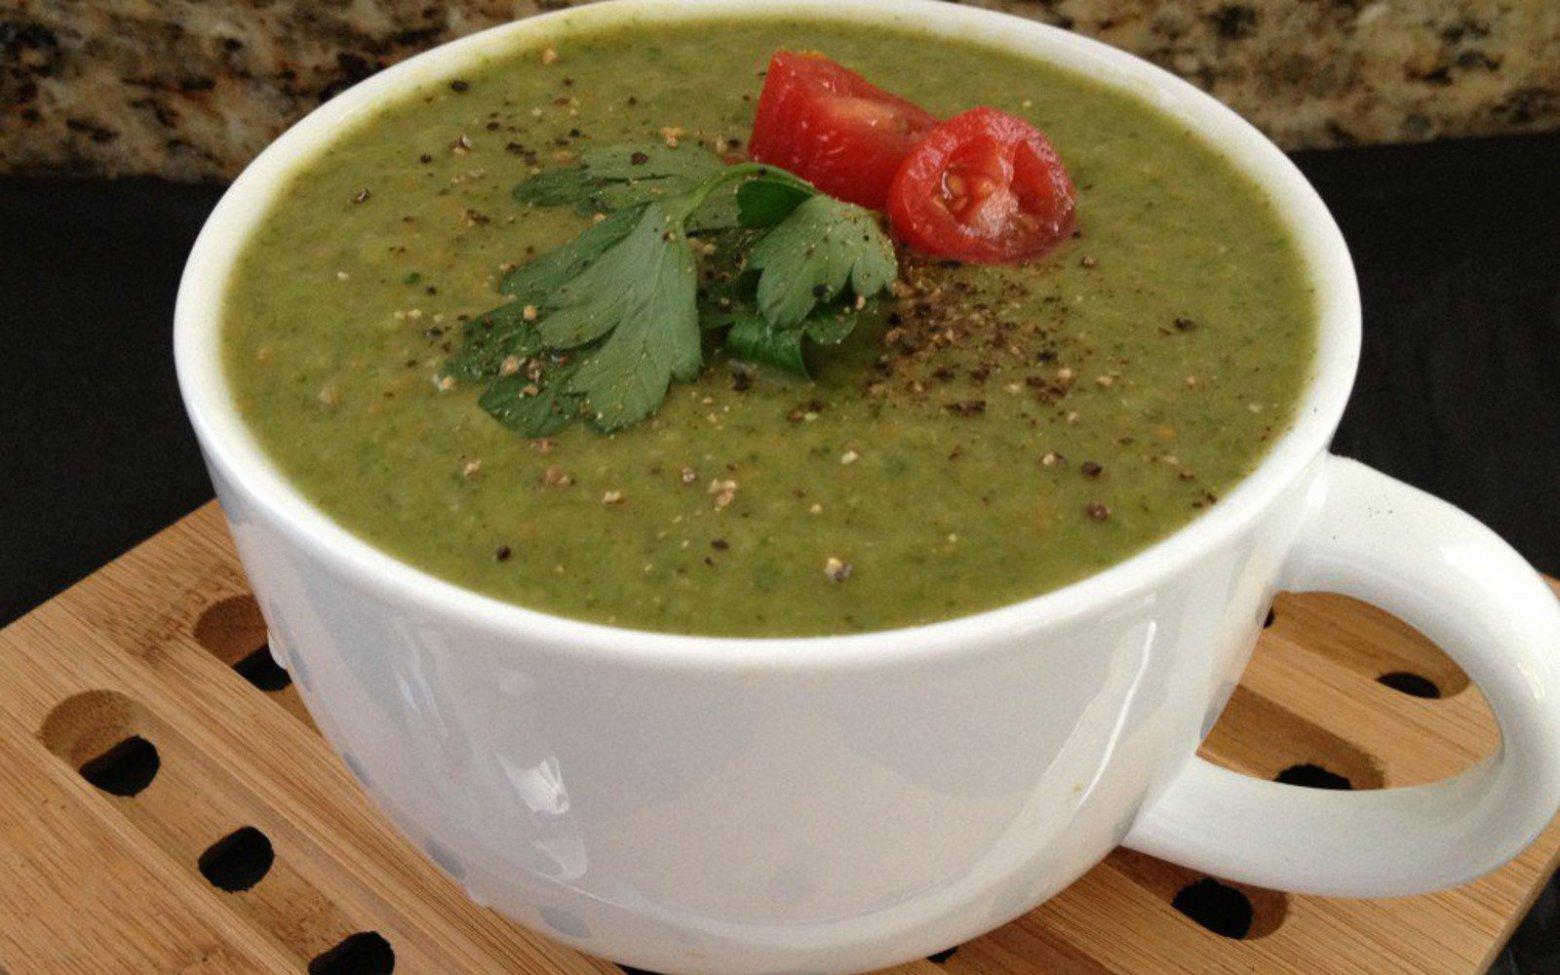 Ayurvedic Spinach-Mung Detox Soup